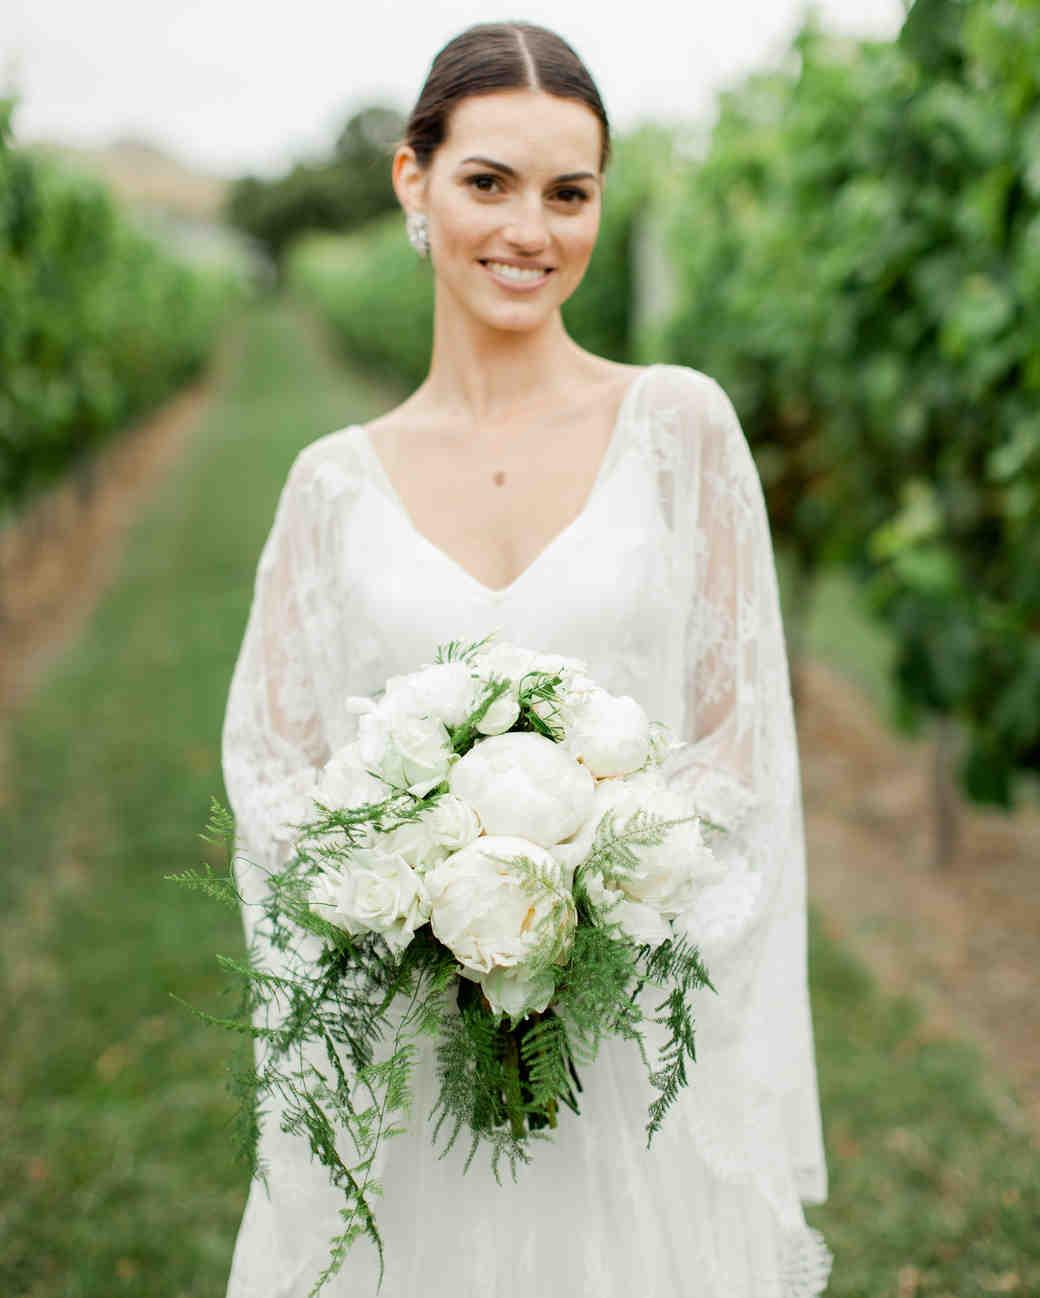 fern Wedding Bouquet with Peonies